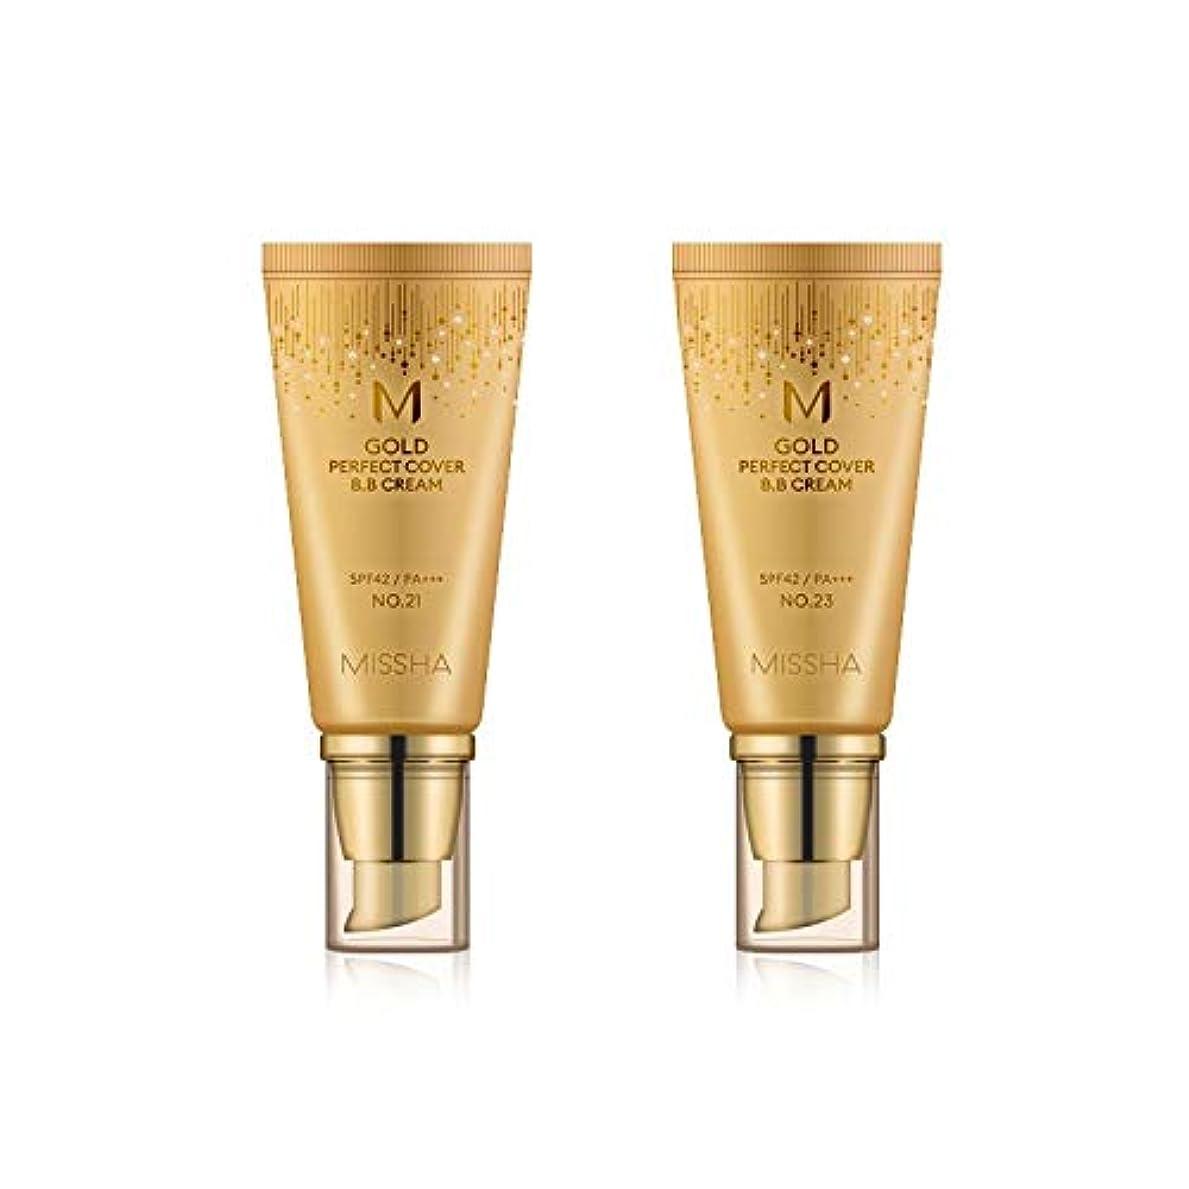 MISSHA Gold Perfecte Cover BB Cream SPF42 PA+++ / ミシャ ゴールド パーフェクト カバー BBクリーム 50ml *NO.21 [並行輸入品]